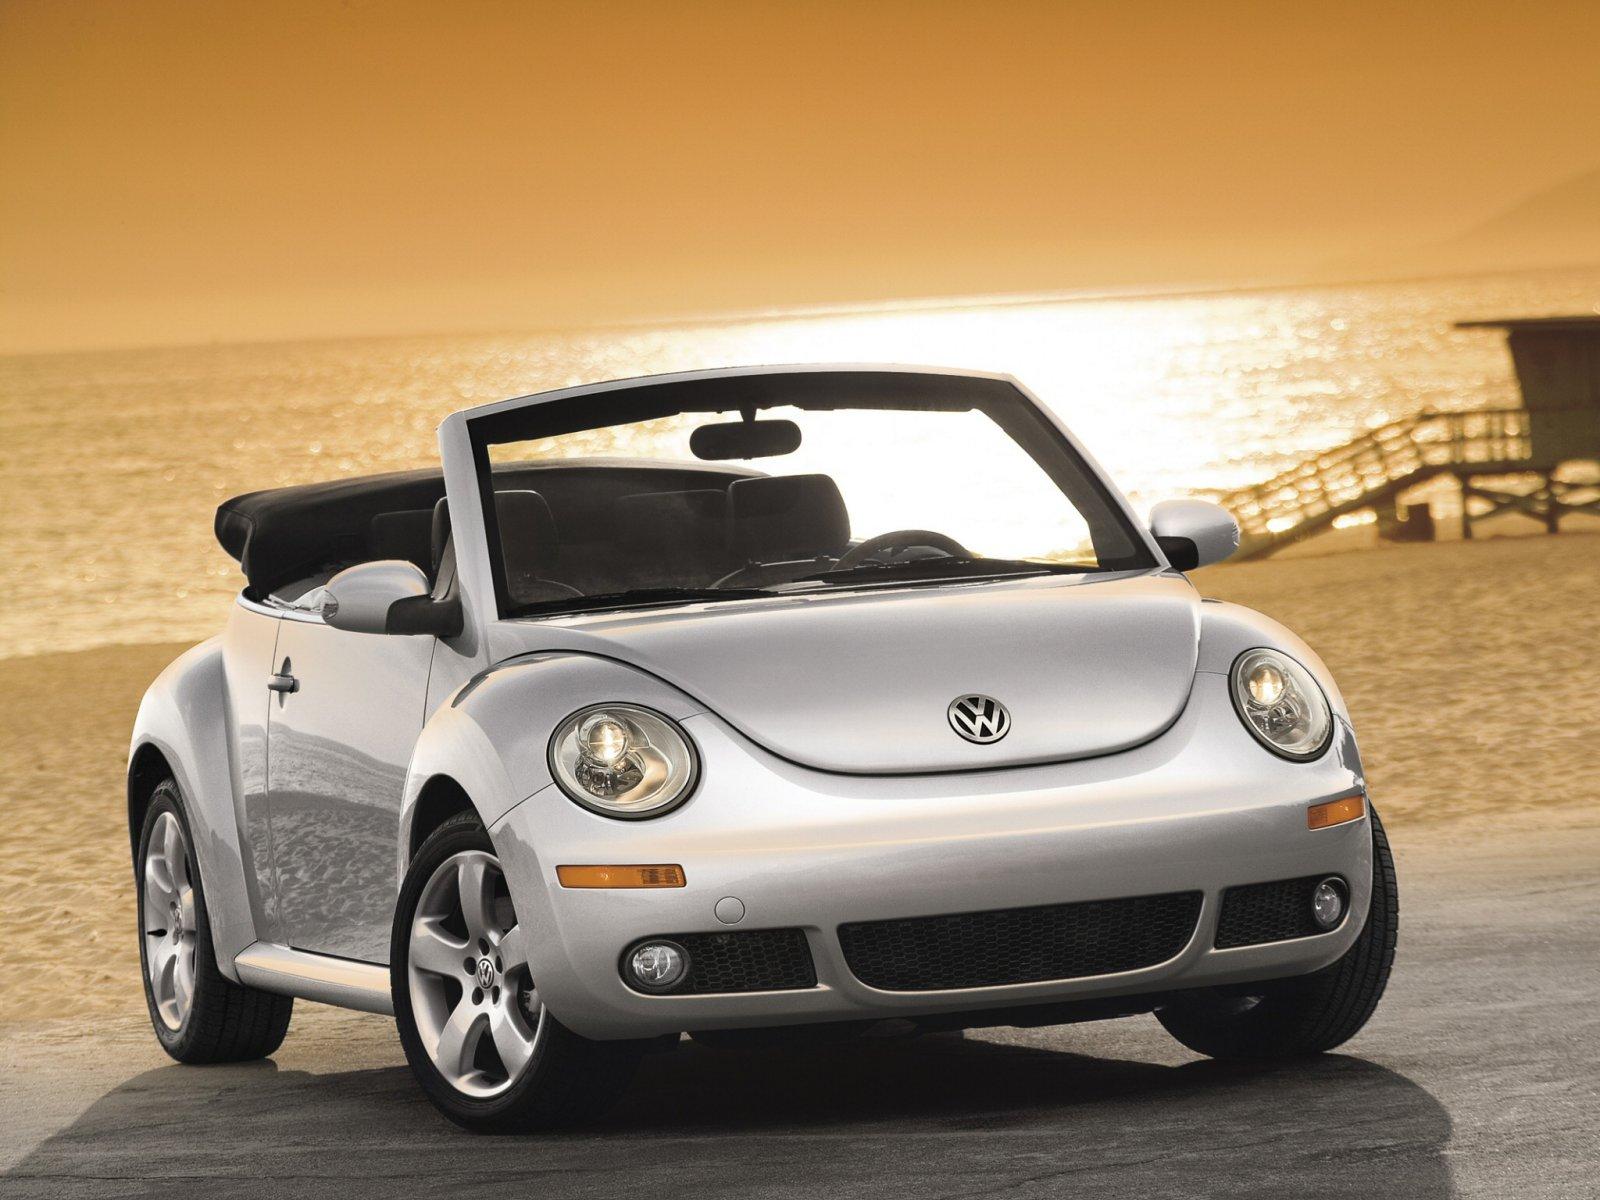 Volkswagen (Фольксваген) Beetle New Cabrio 2005-2011 г.